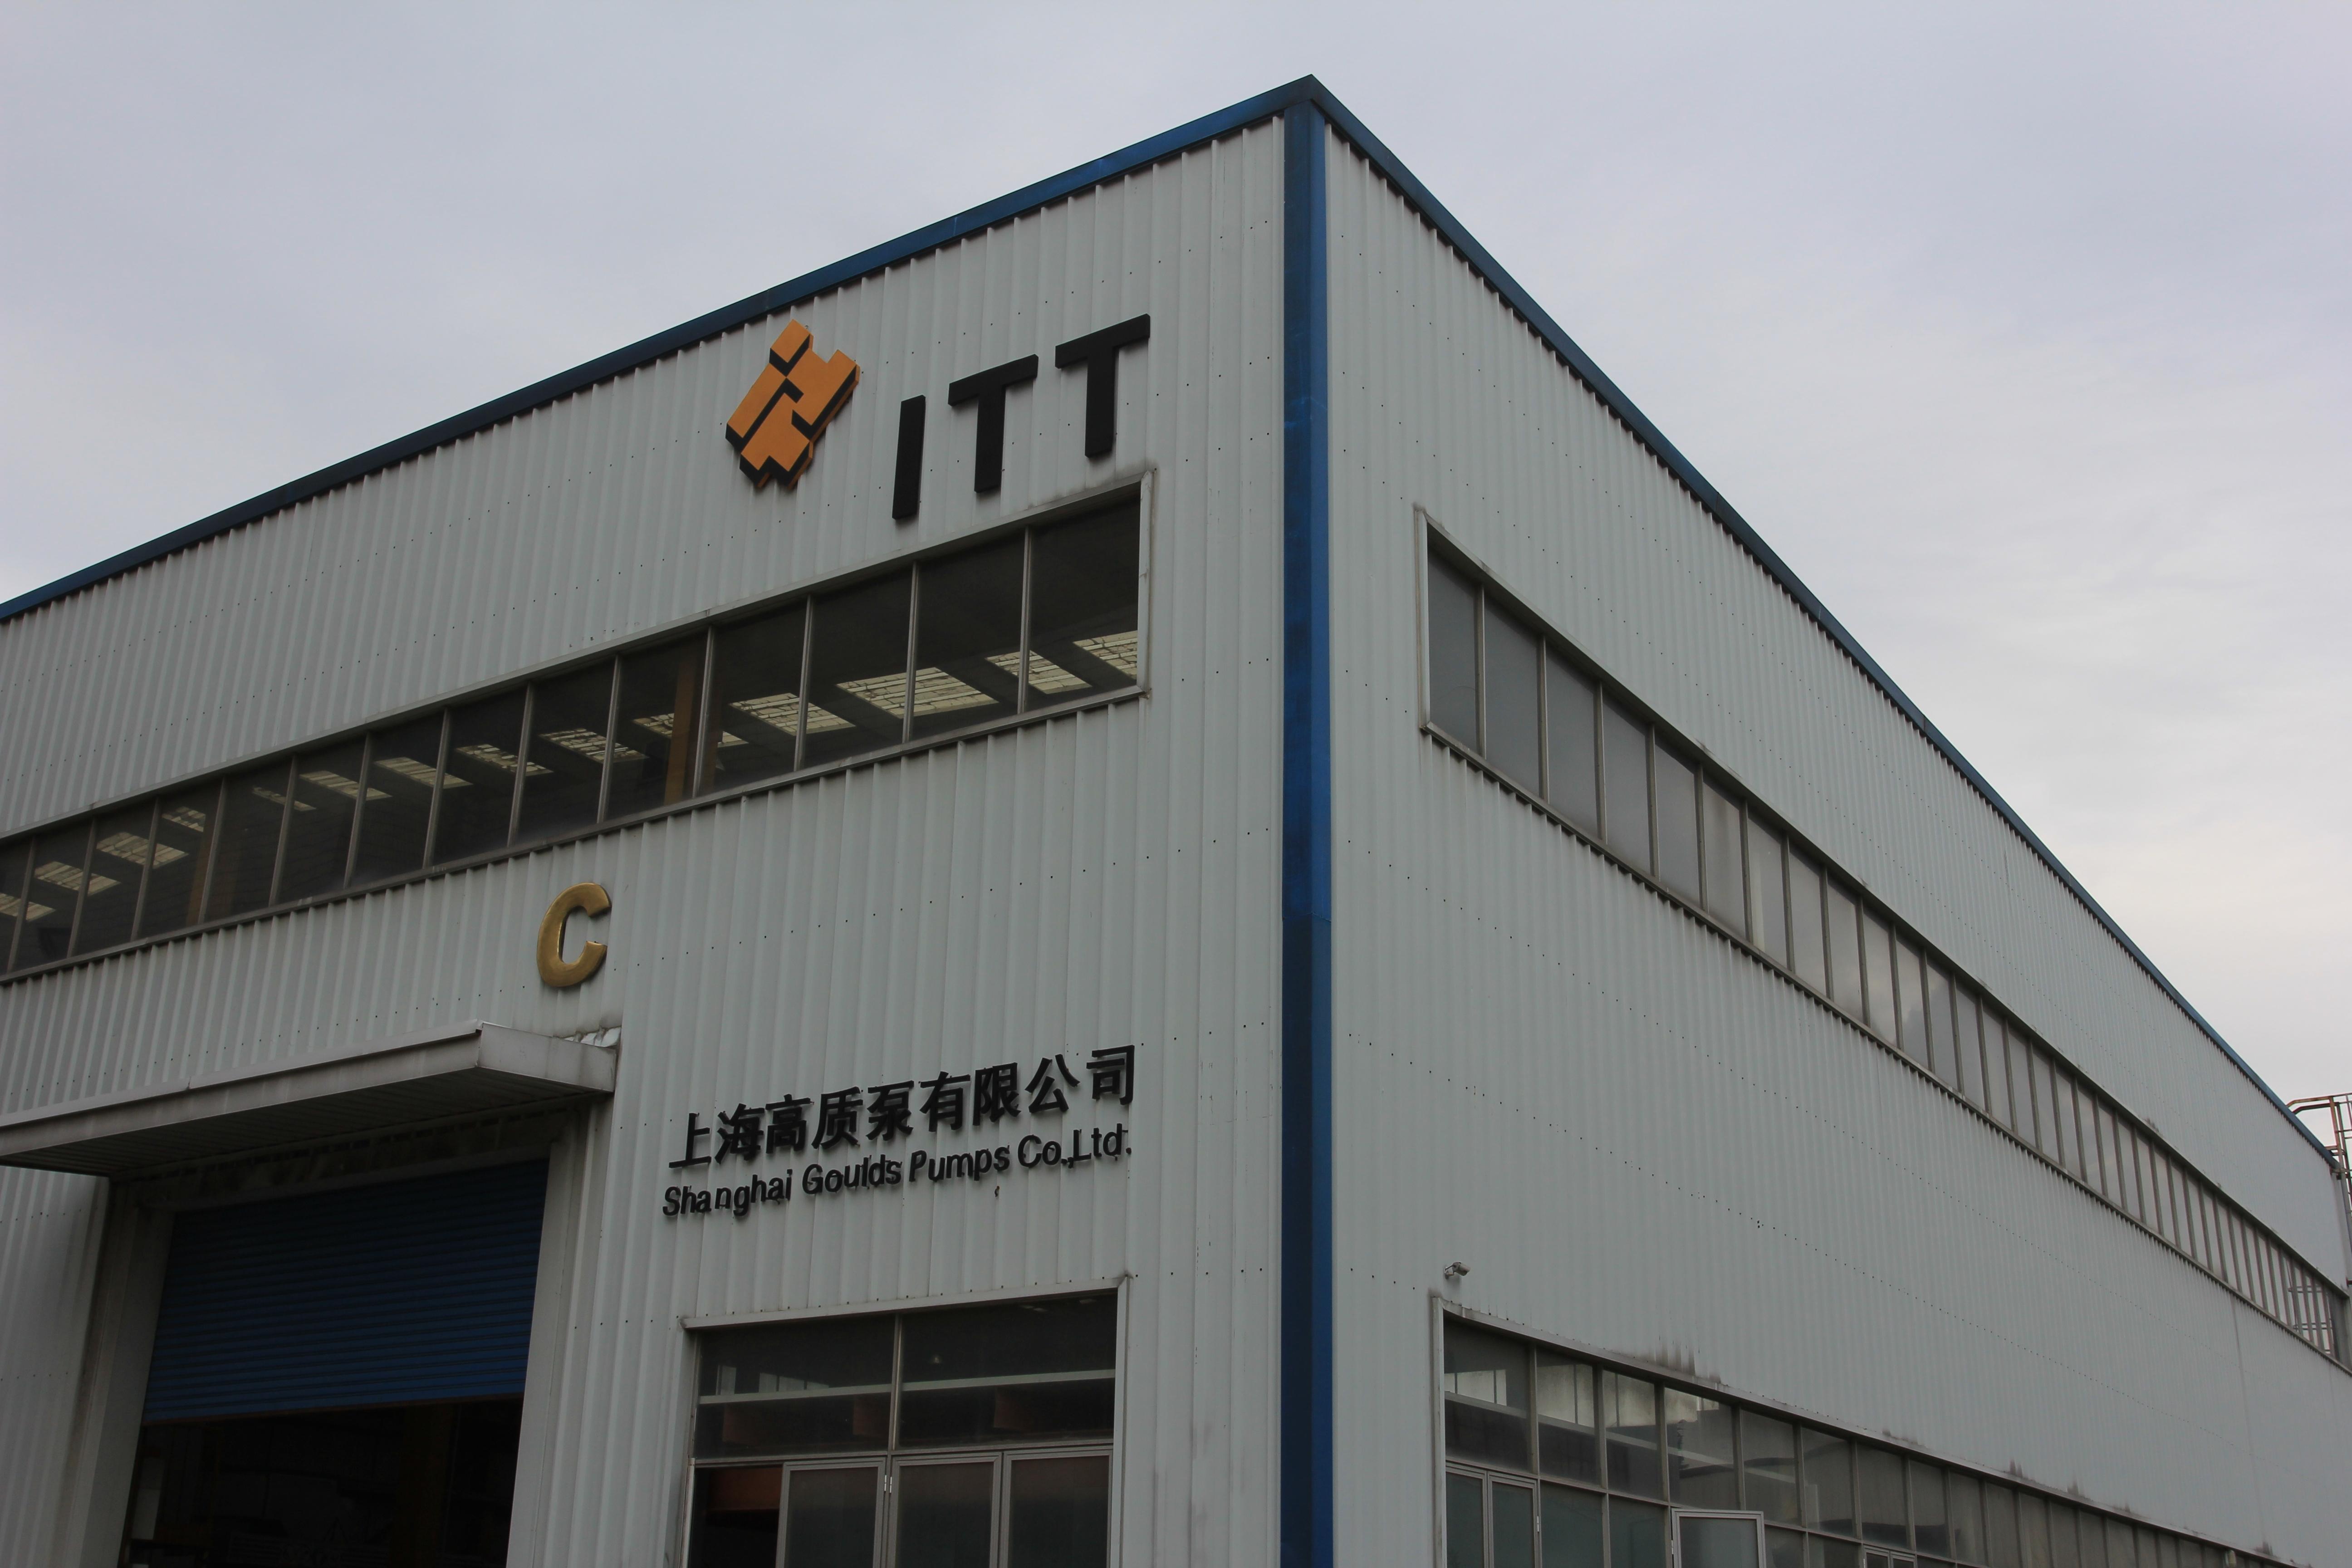 ITT Goulds Pumps is a leading manufacturer of pumps for a